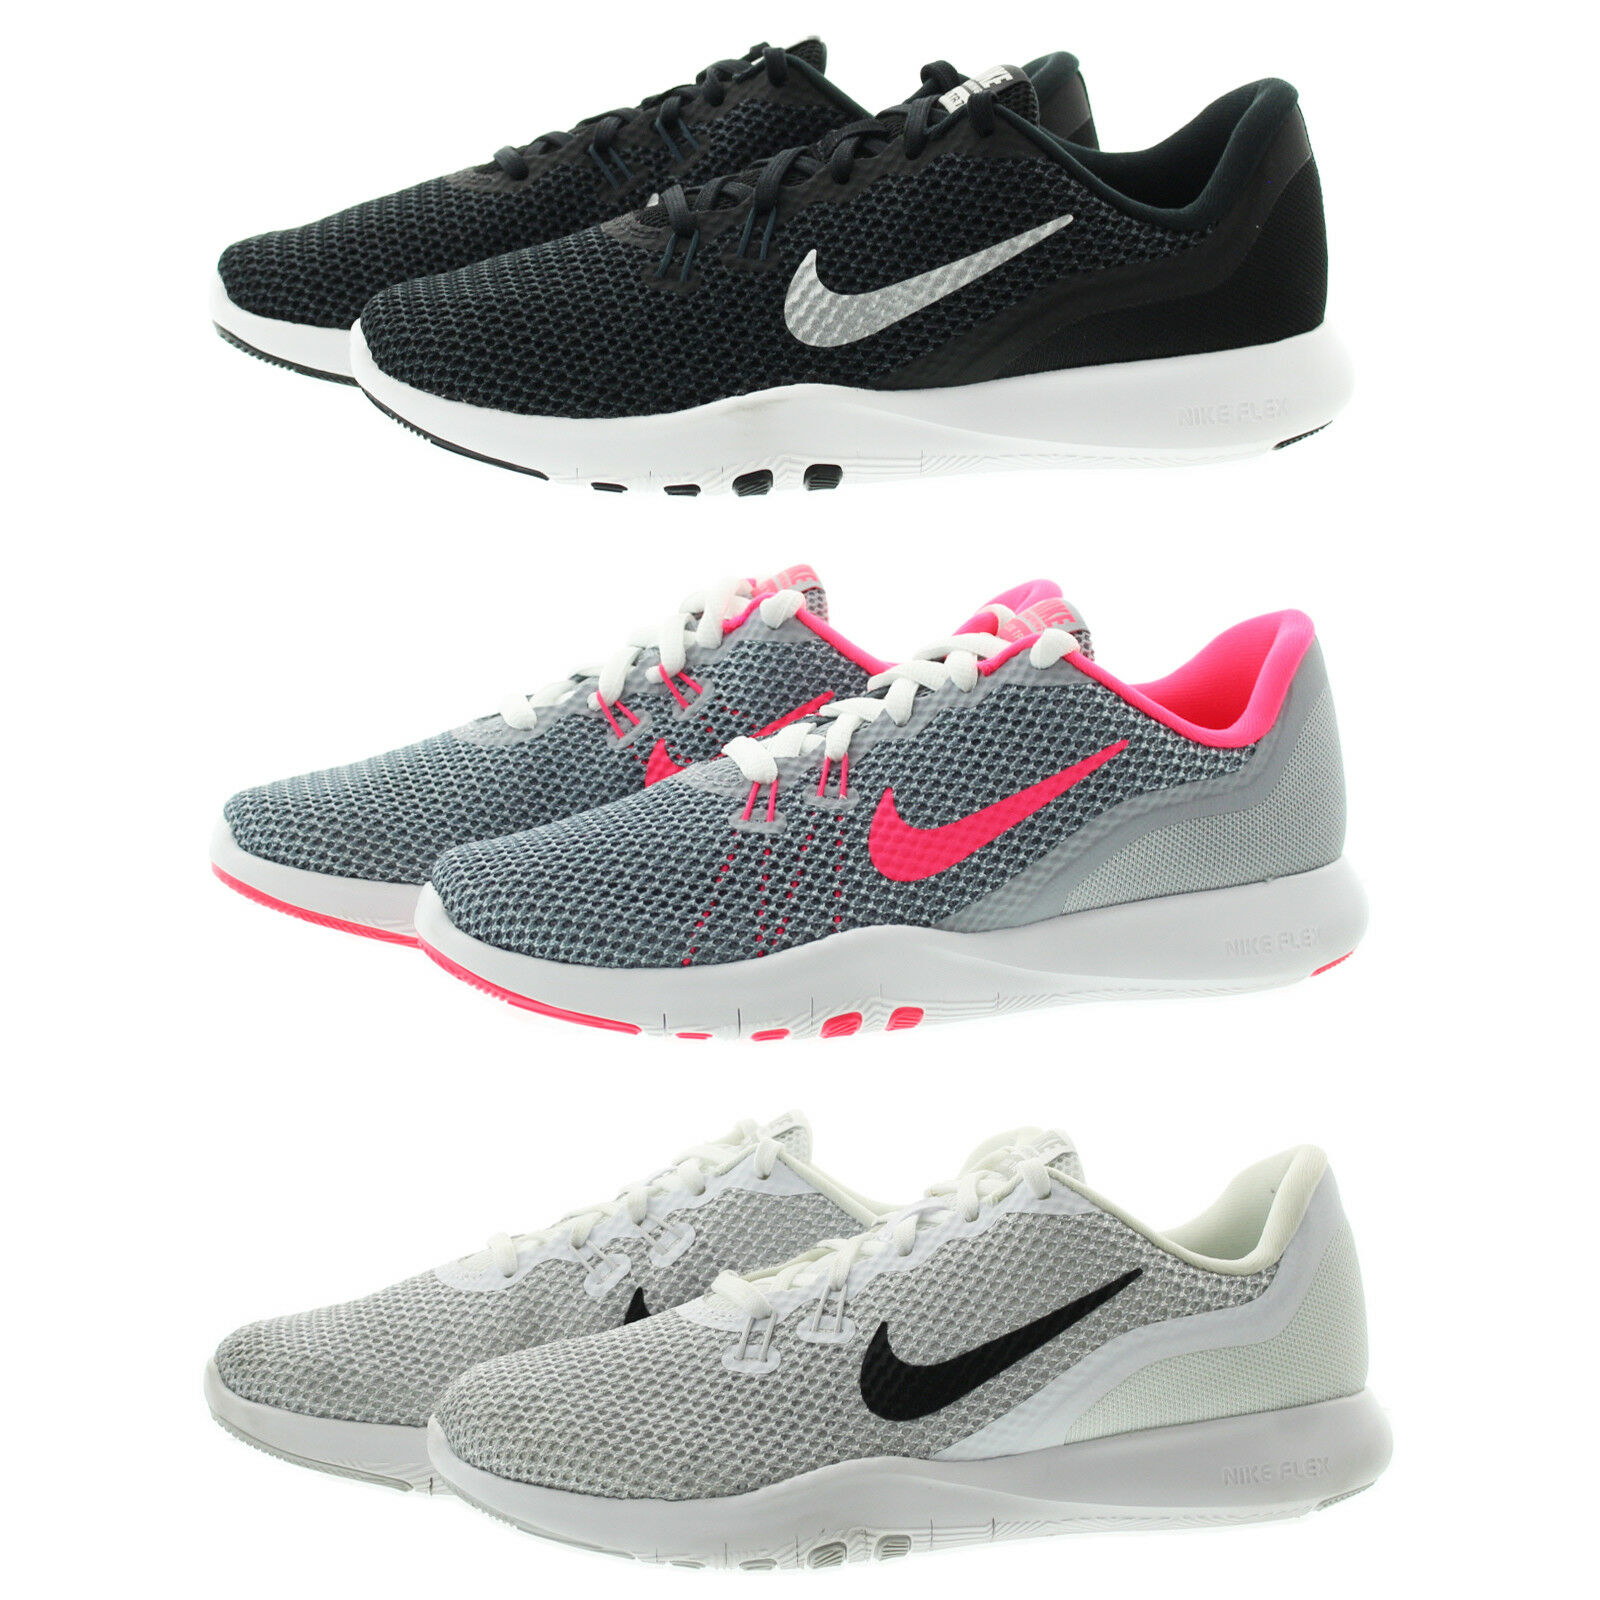 Nike 898479 Womens Flex Trainer 7 Cross